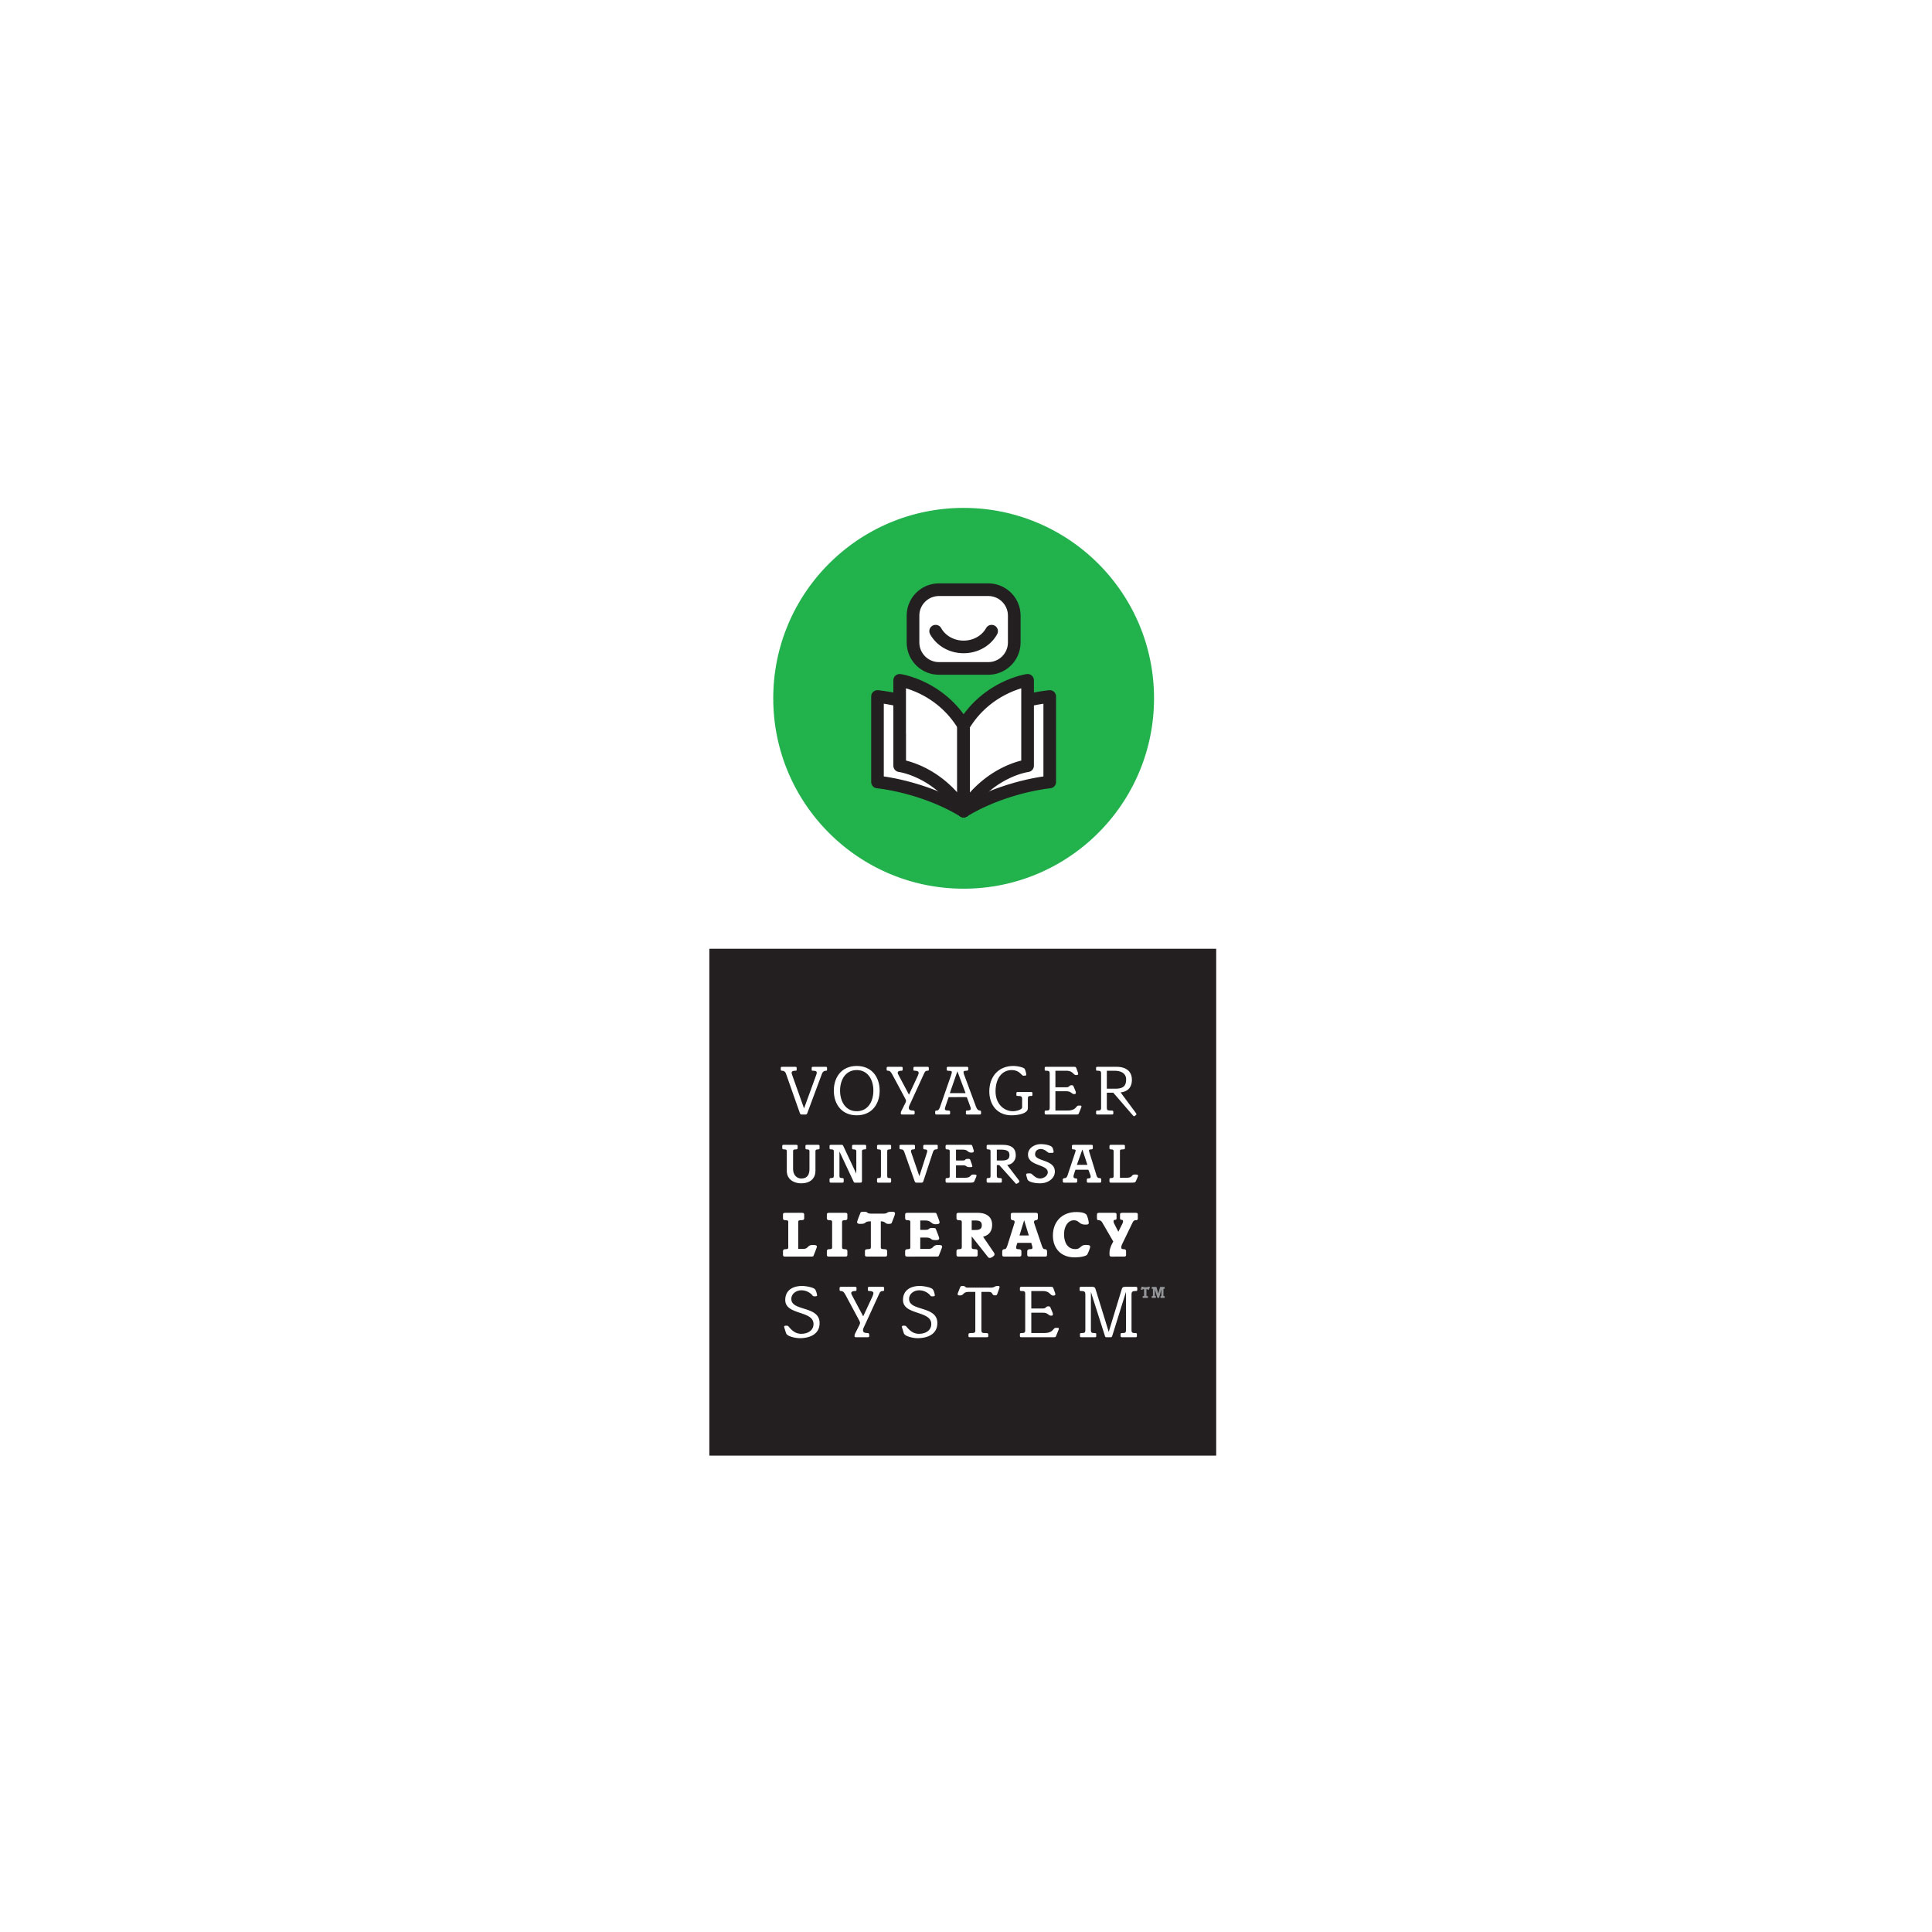 Voyager Universal Literacy System